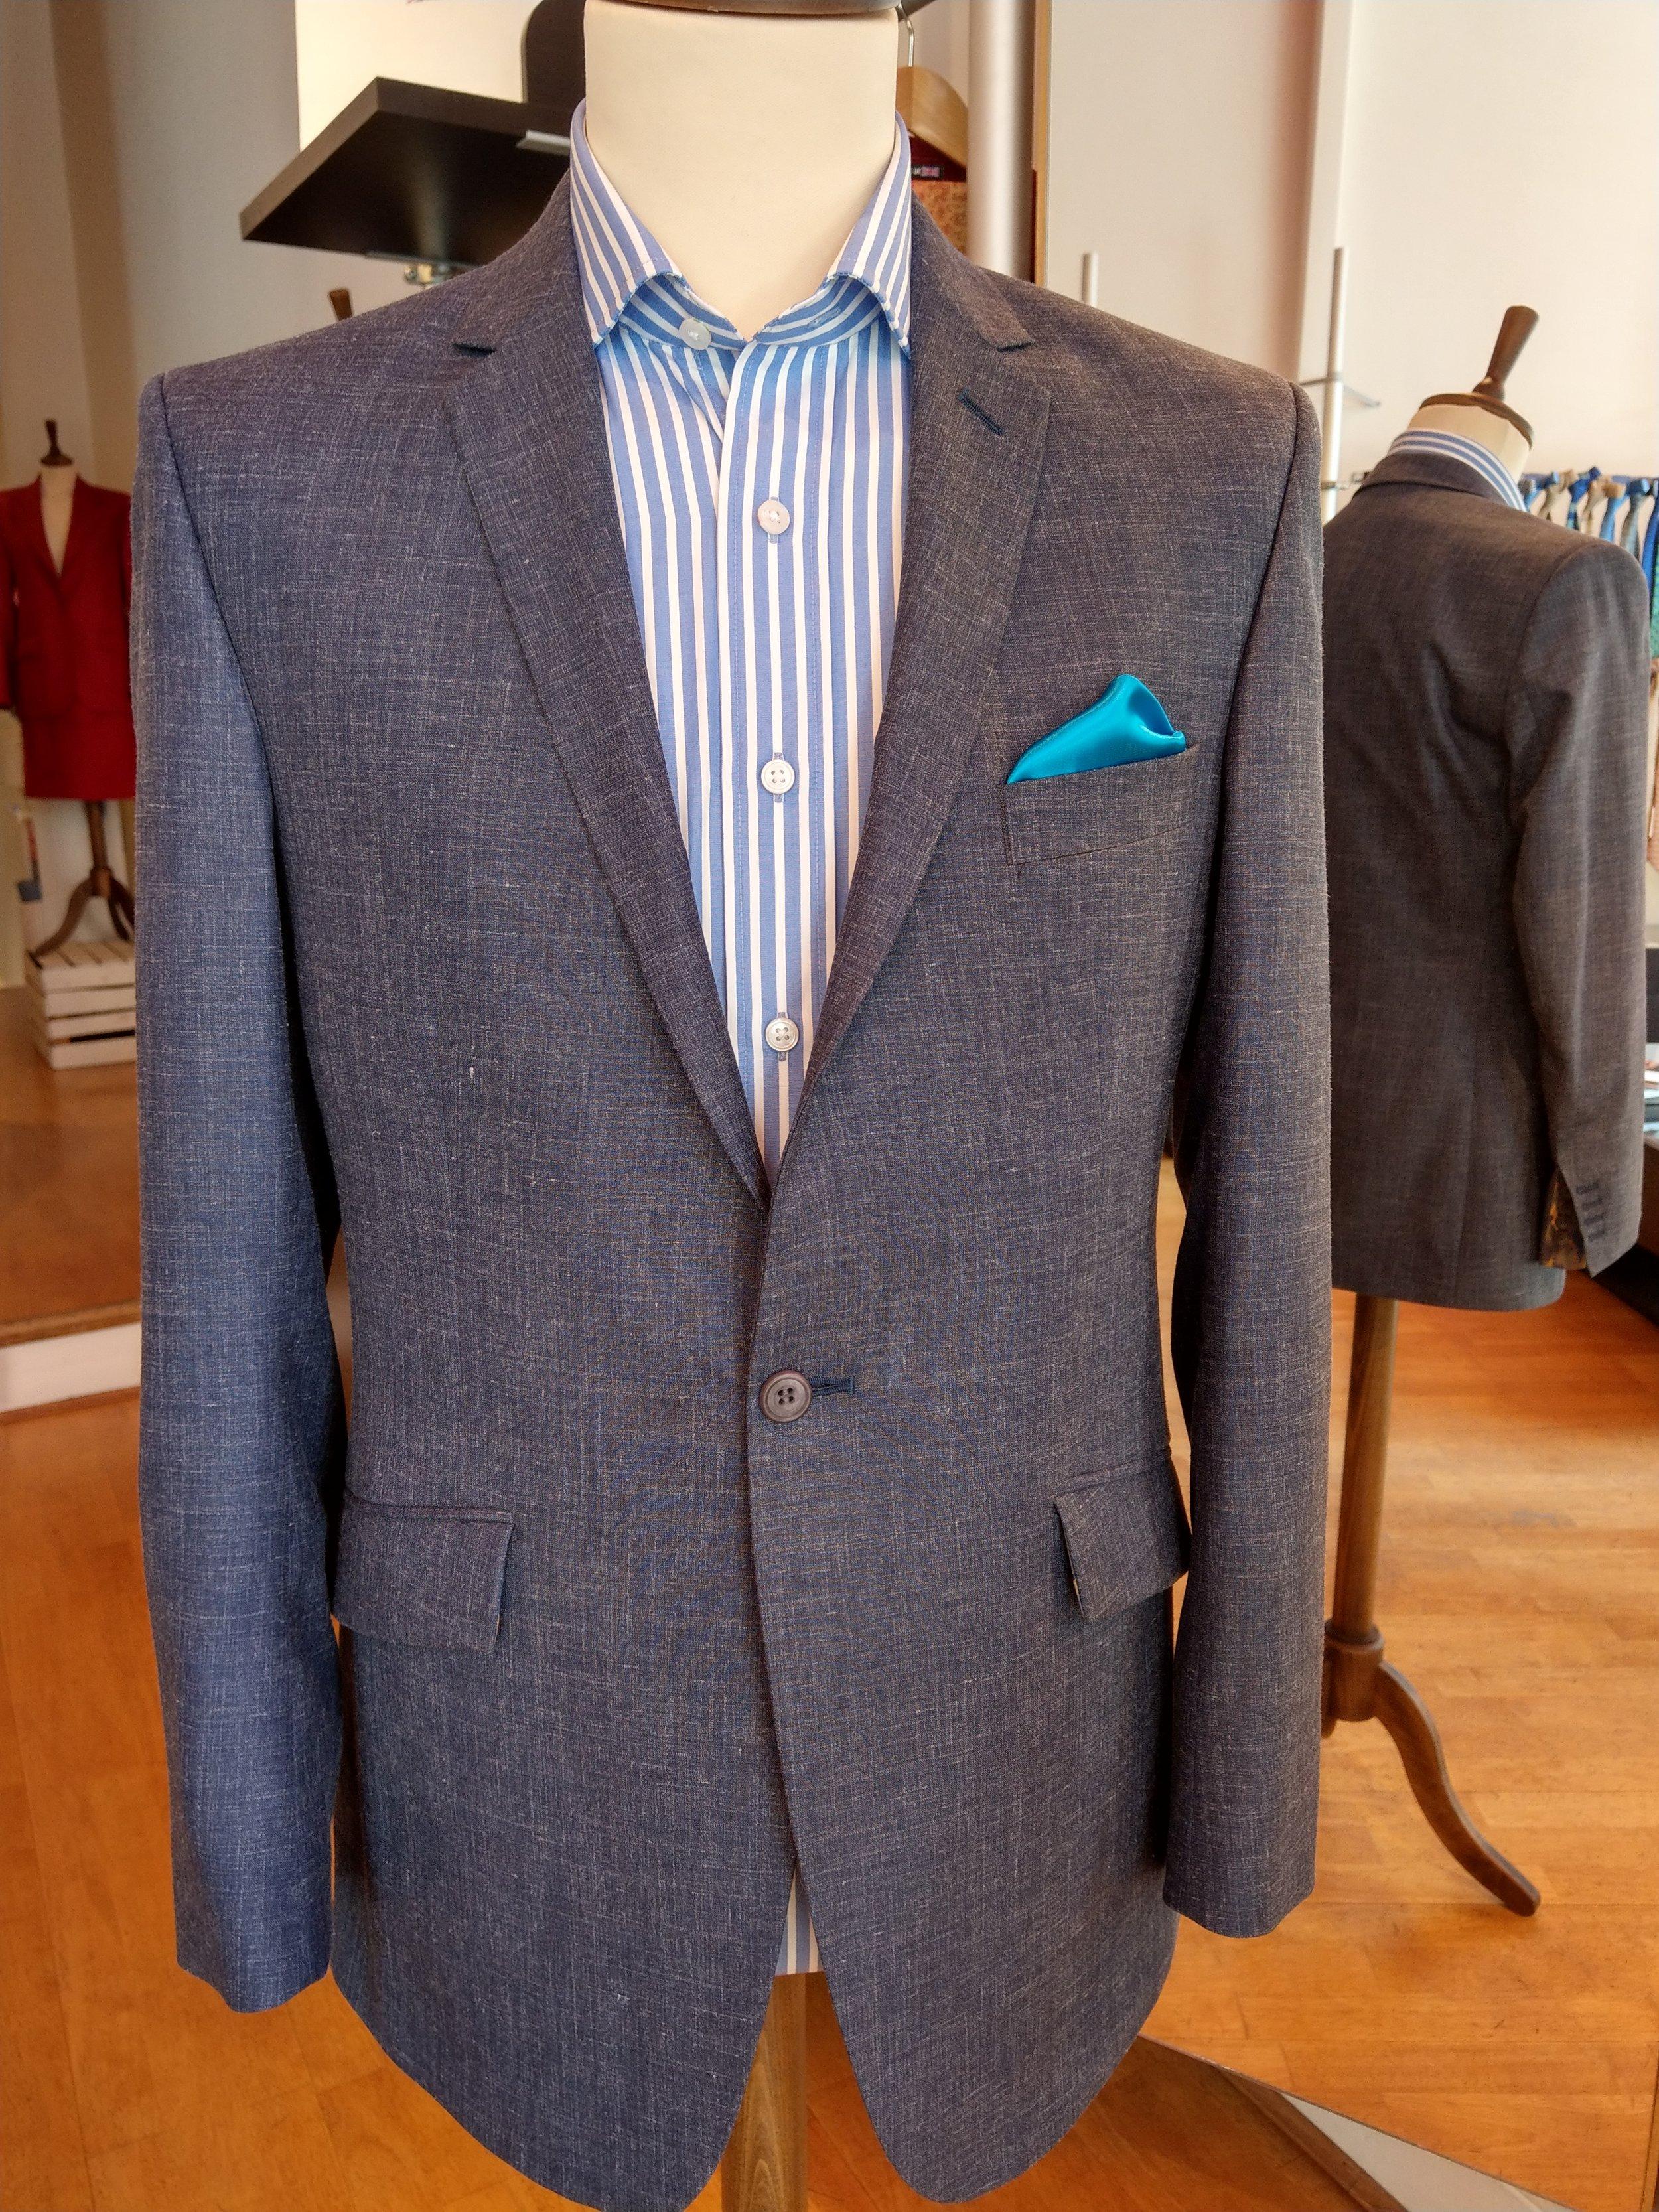 susannah-hall-dormeuil-linen-silk-bespoke-tailor-jacket-suit-made-britain-uk.jpg